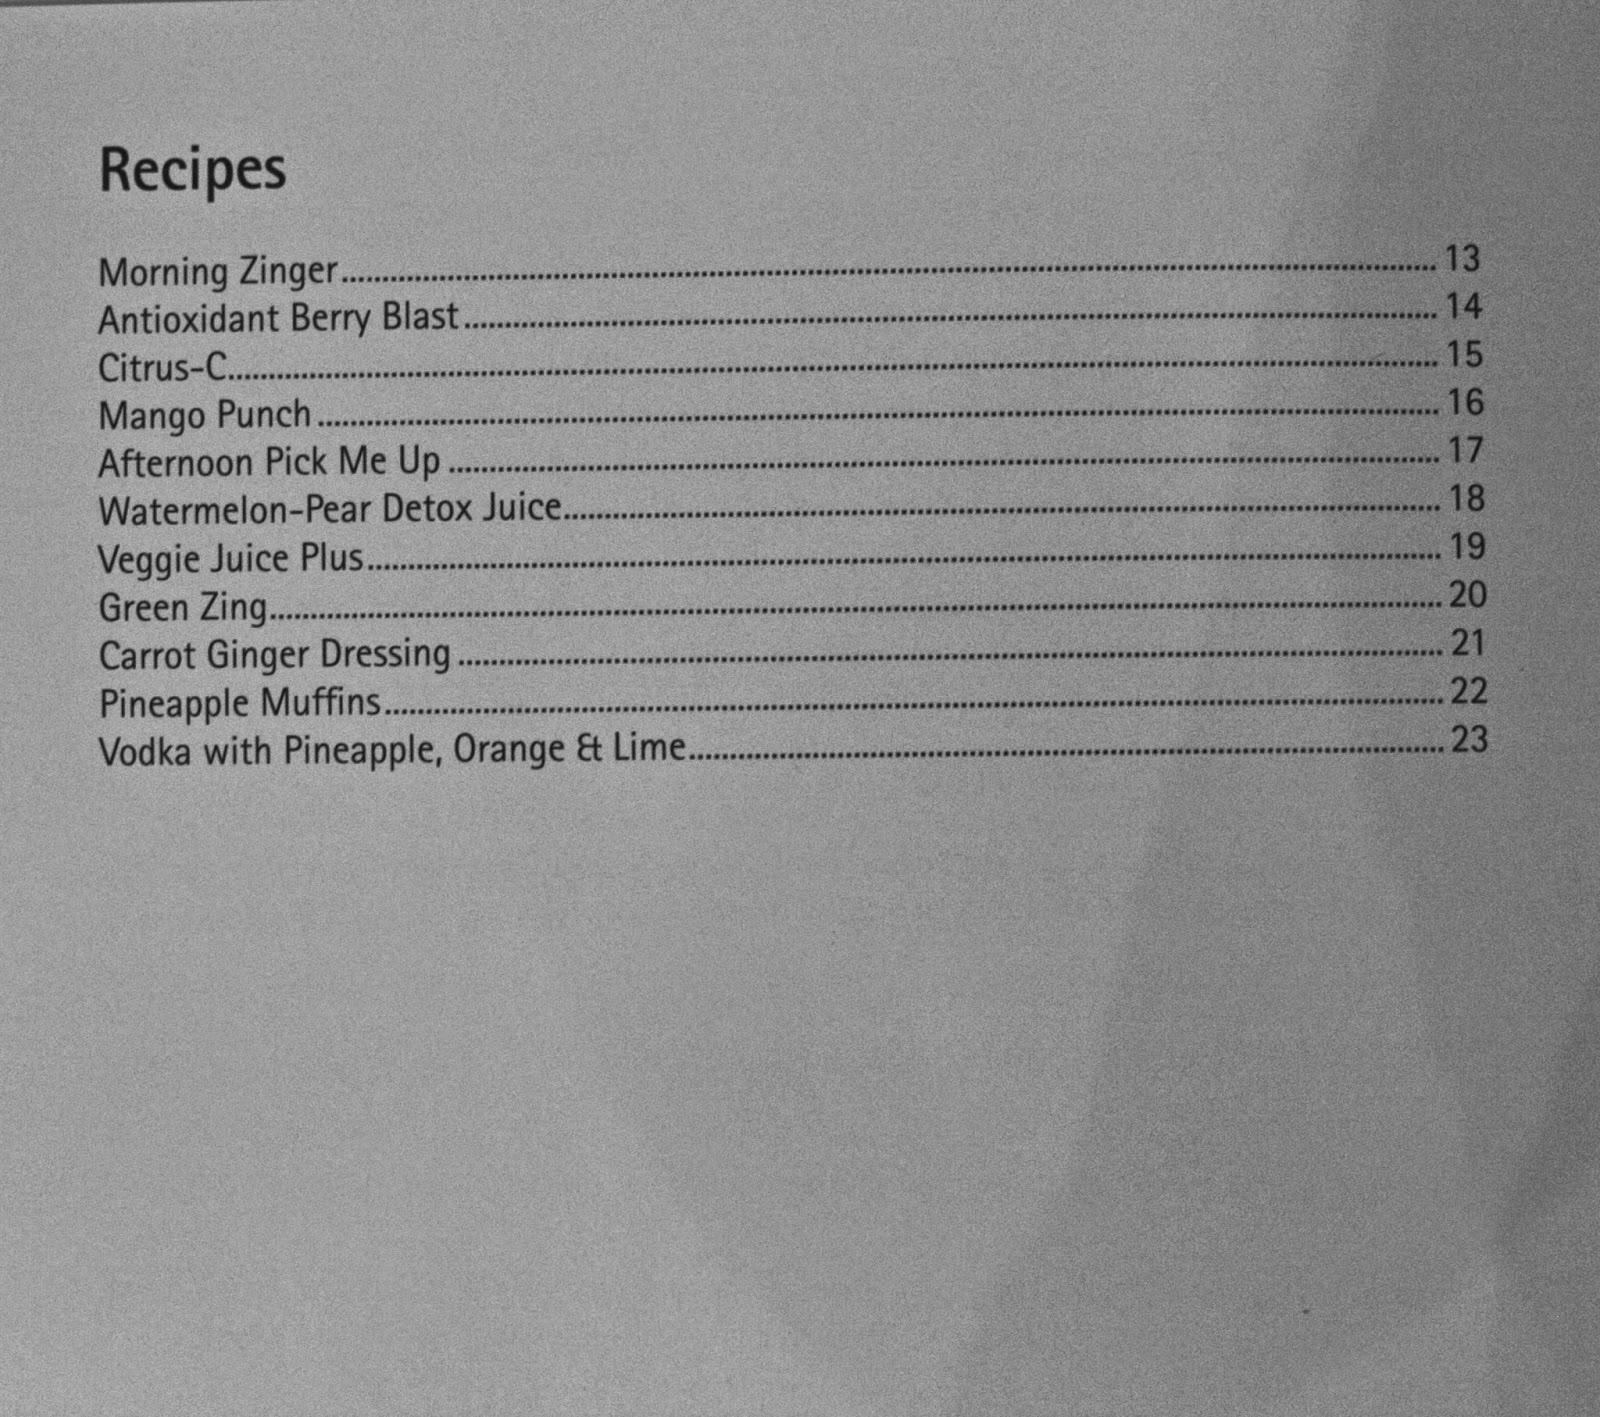 Juice recipe list in Cuisinart Compact Juicer's manual